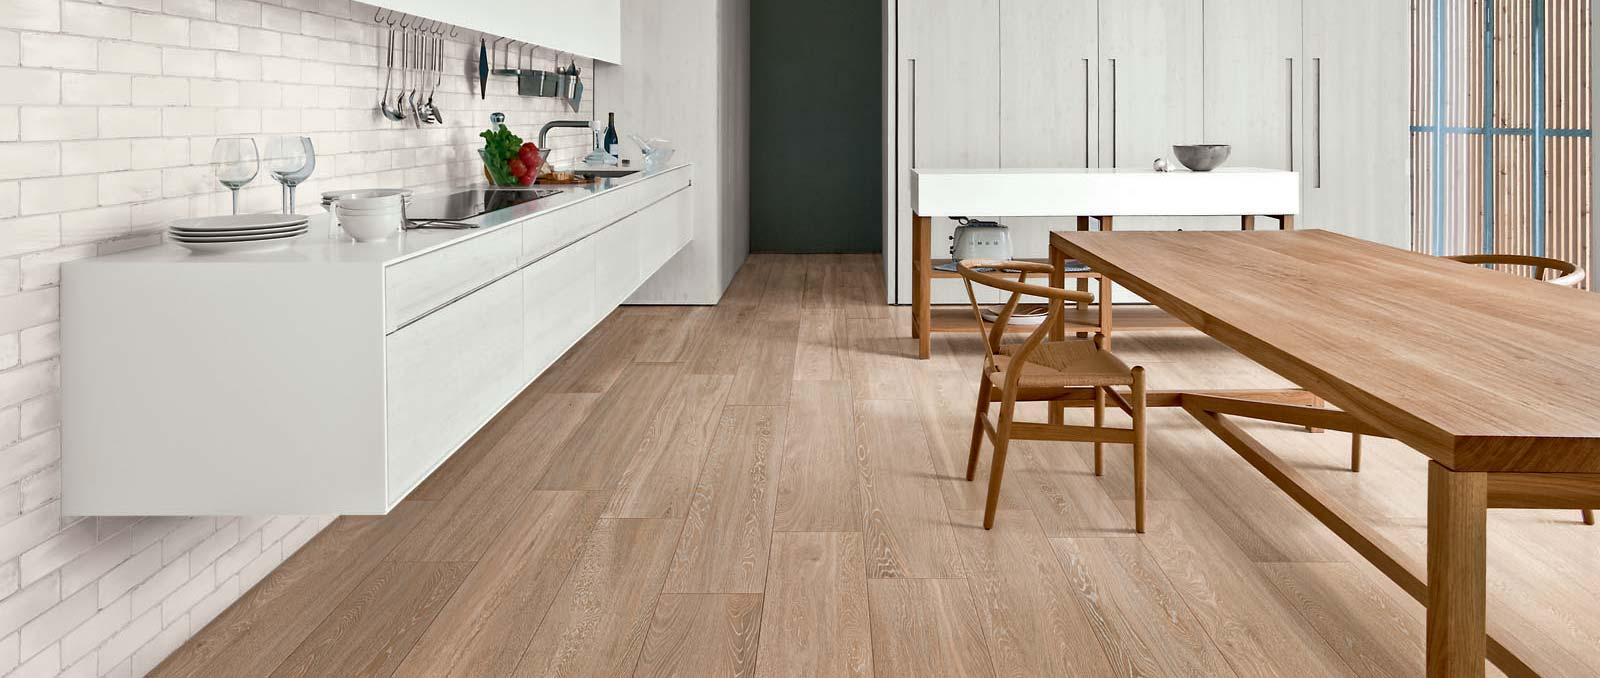 Total White Look: Cucina Bianca e Moderna  Ragno